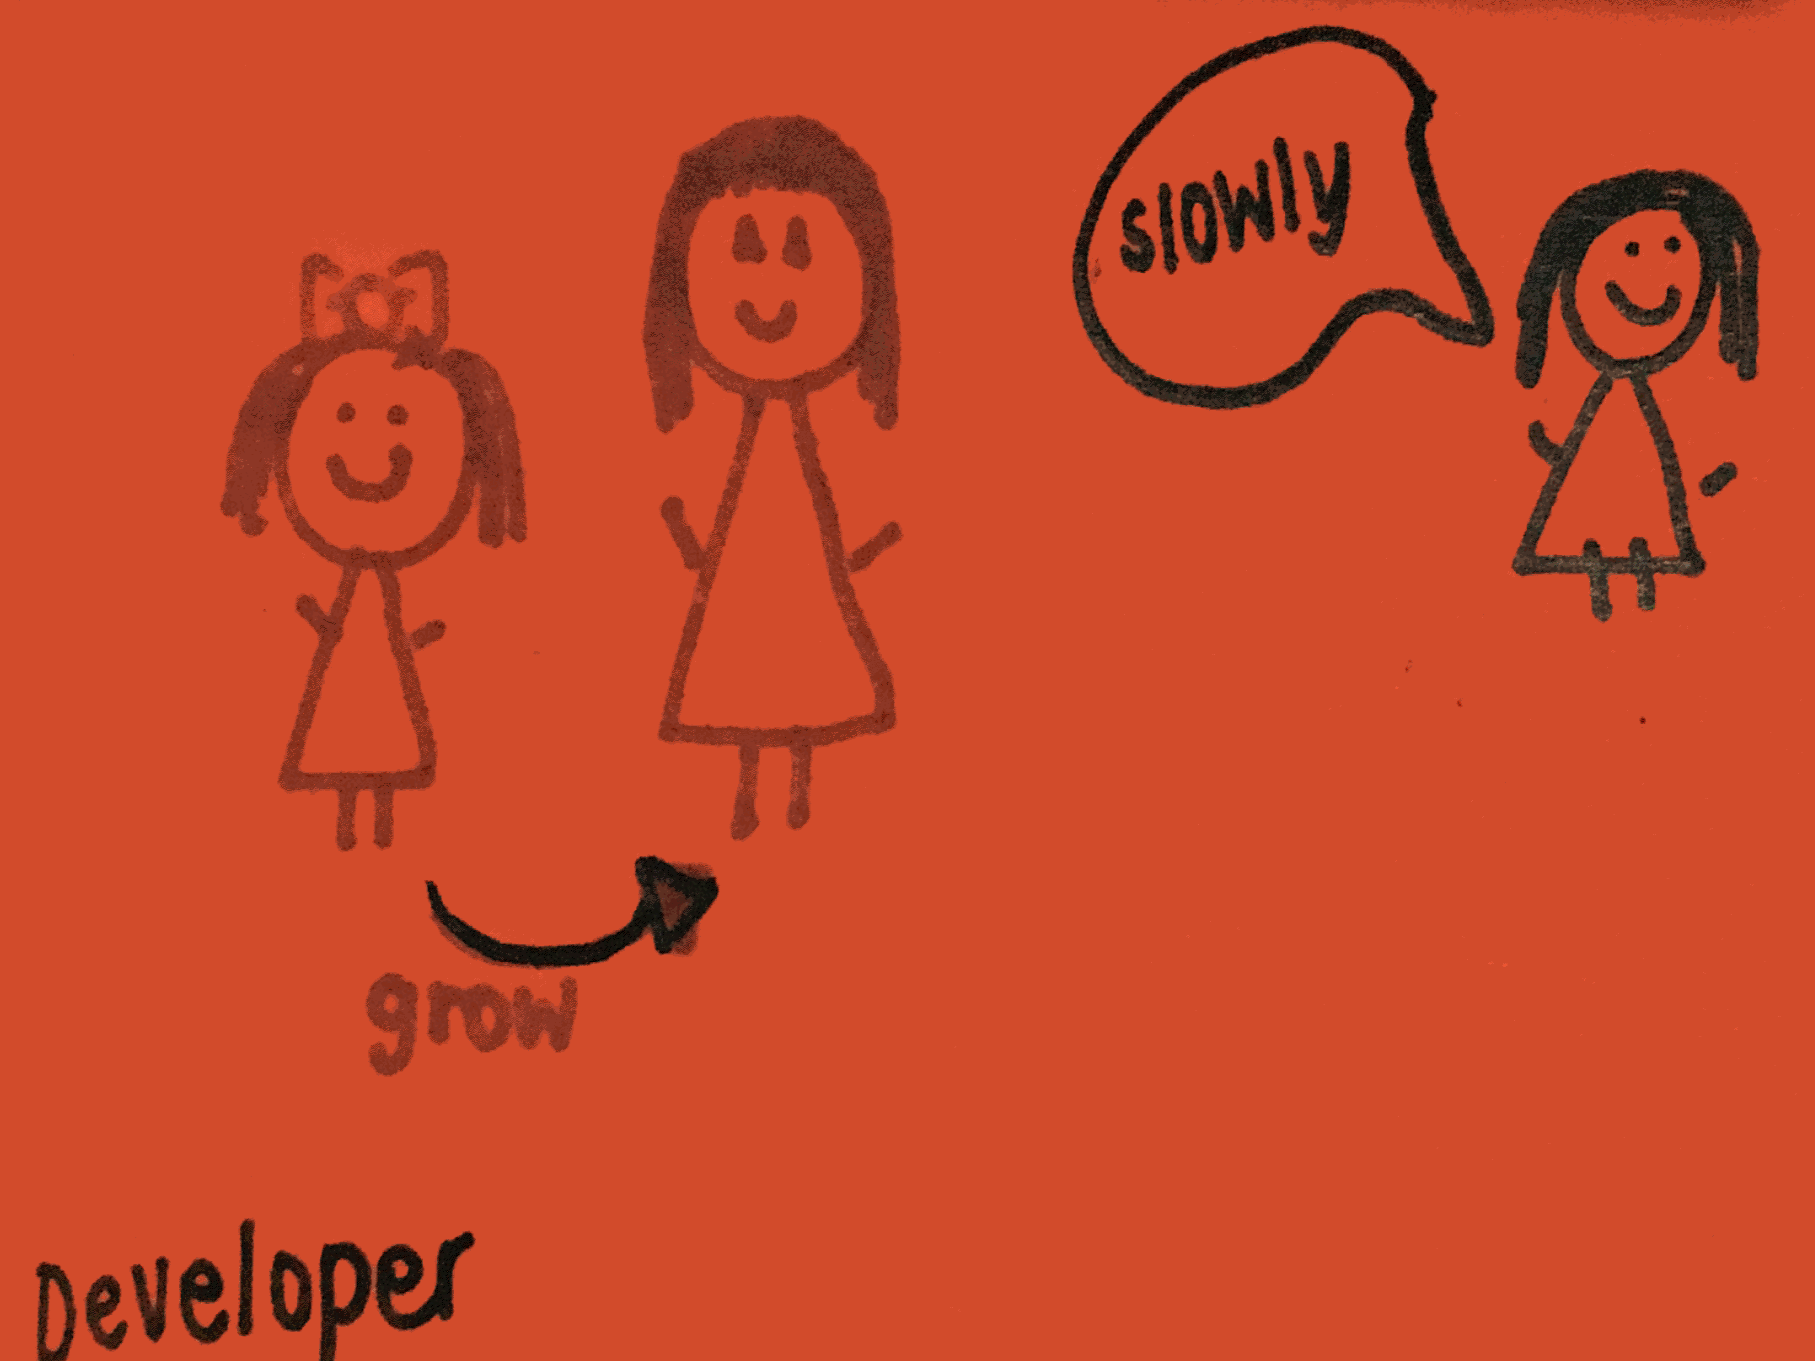 Developer Strengthsfinder Growing Slowly